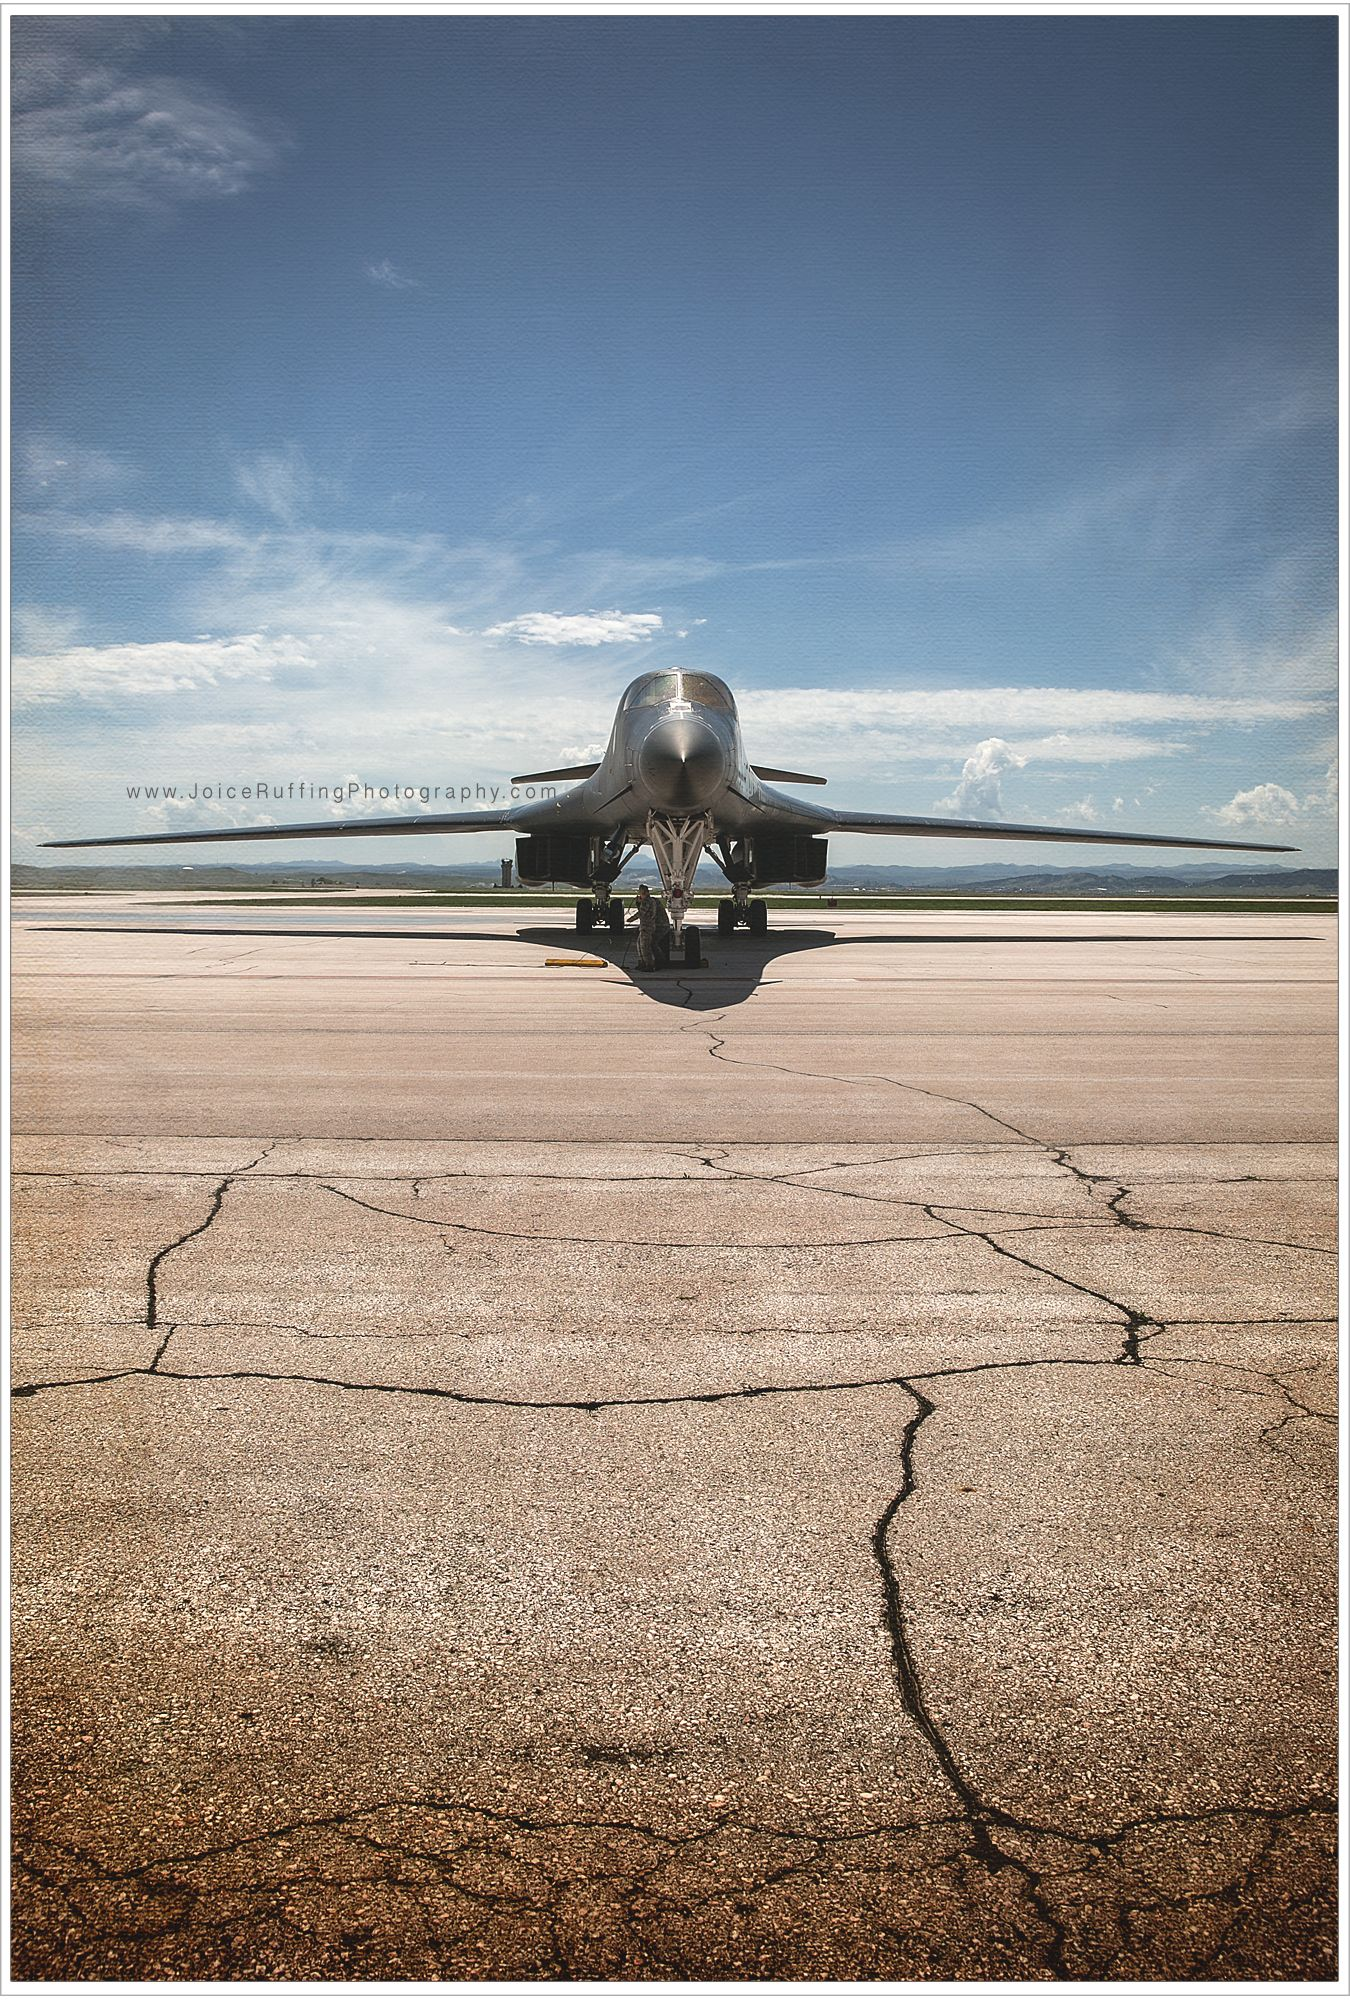 B1 Bomber, Air Force B1B Black Hills Rockwell B1